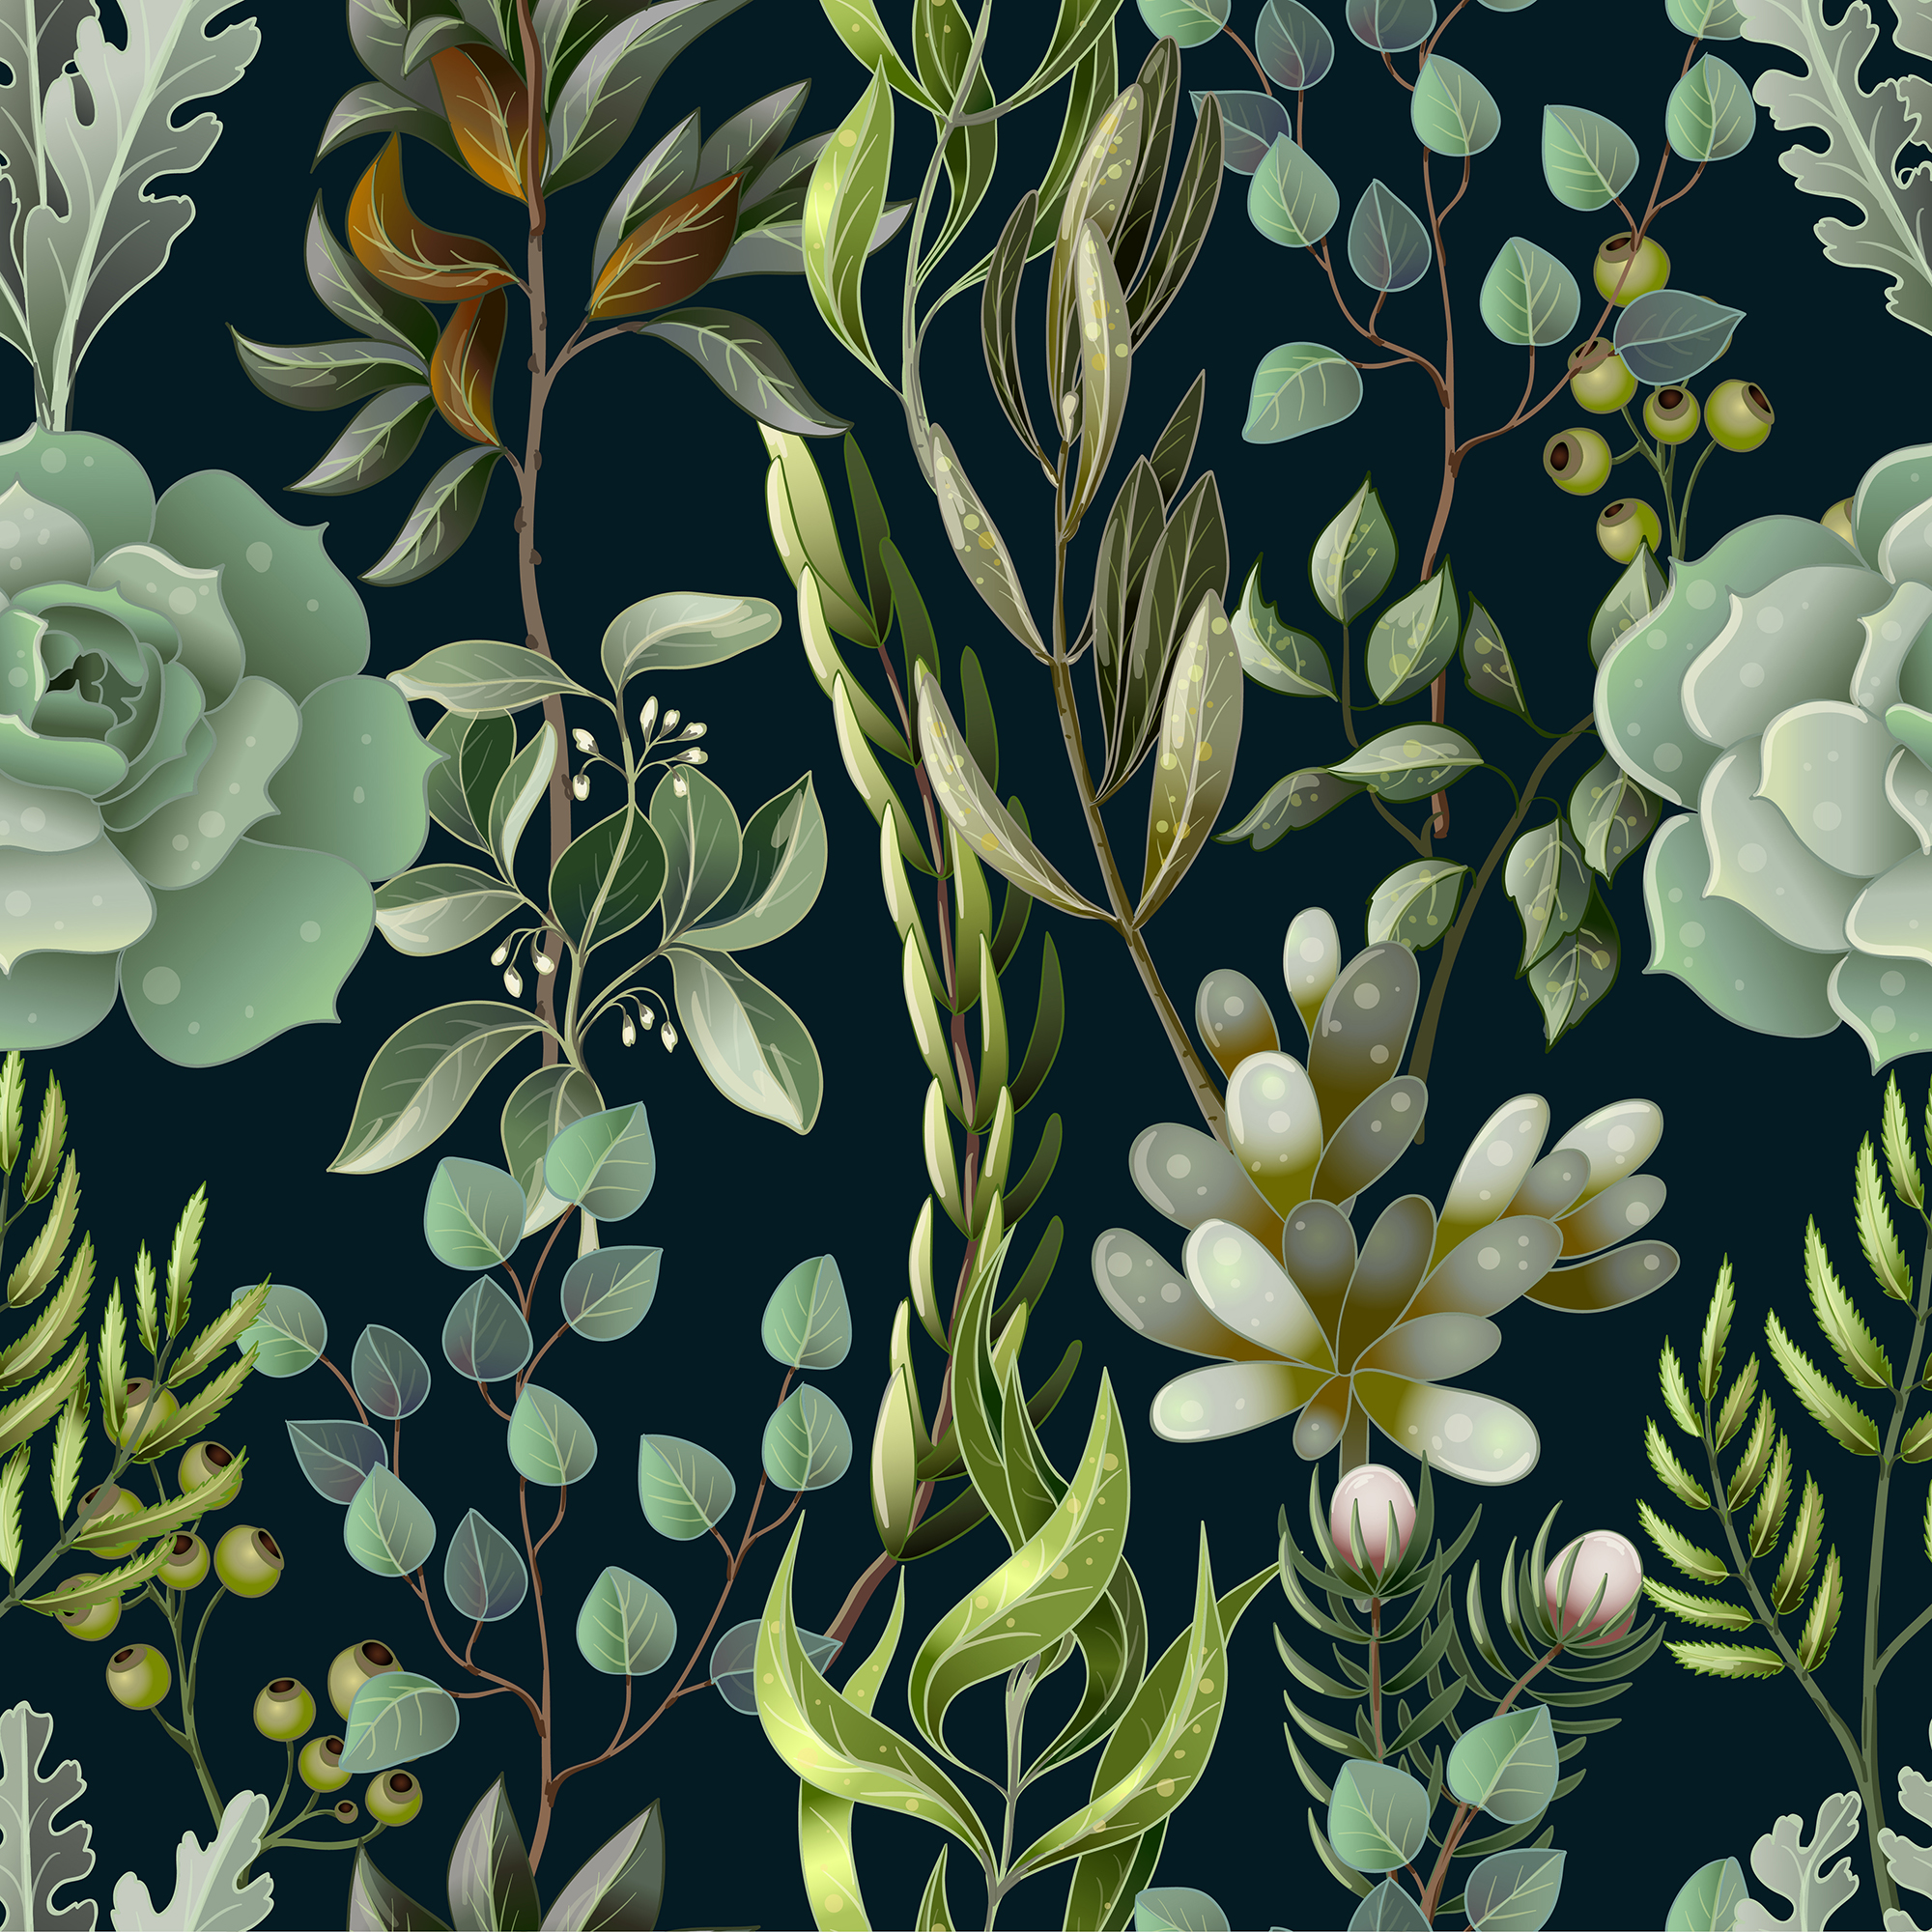 Wedding greenery invitation, patterns and isolated elements example image 4